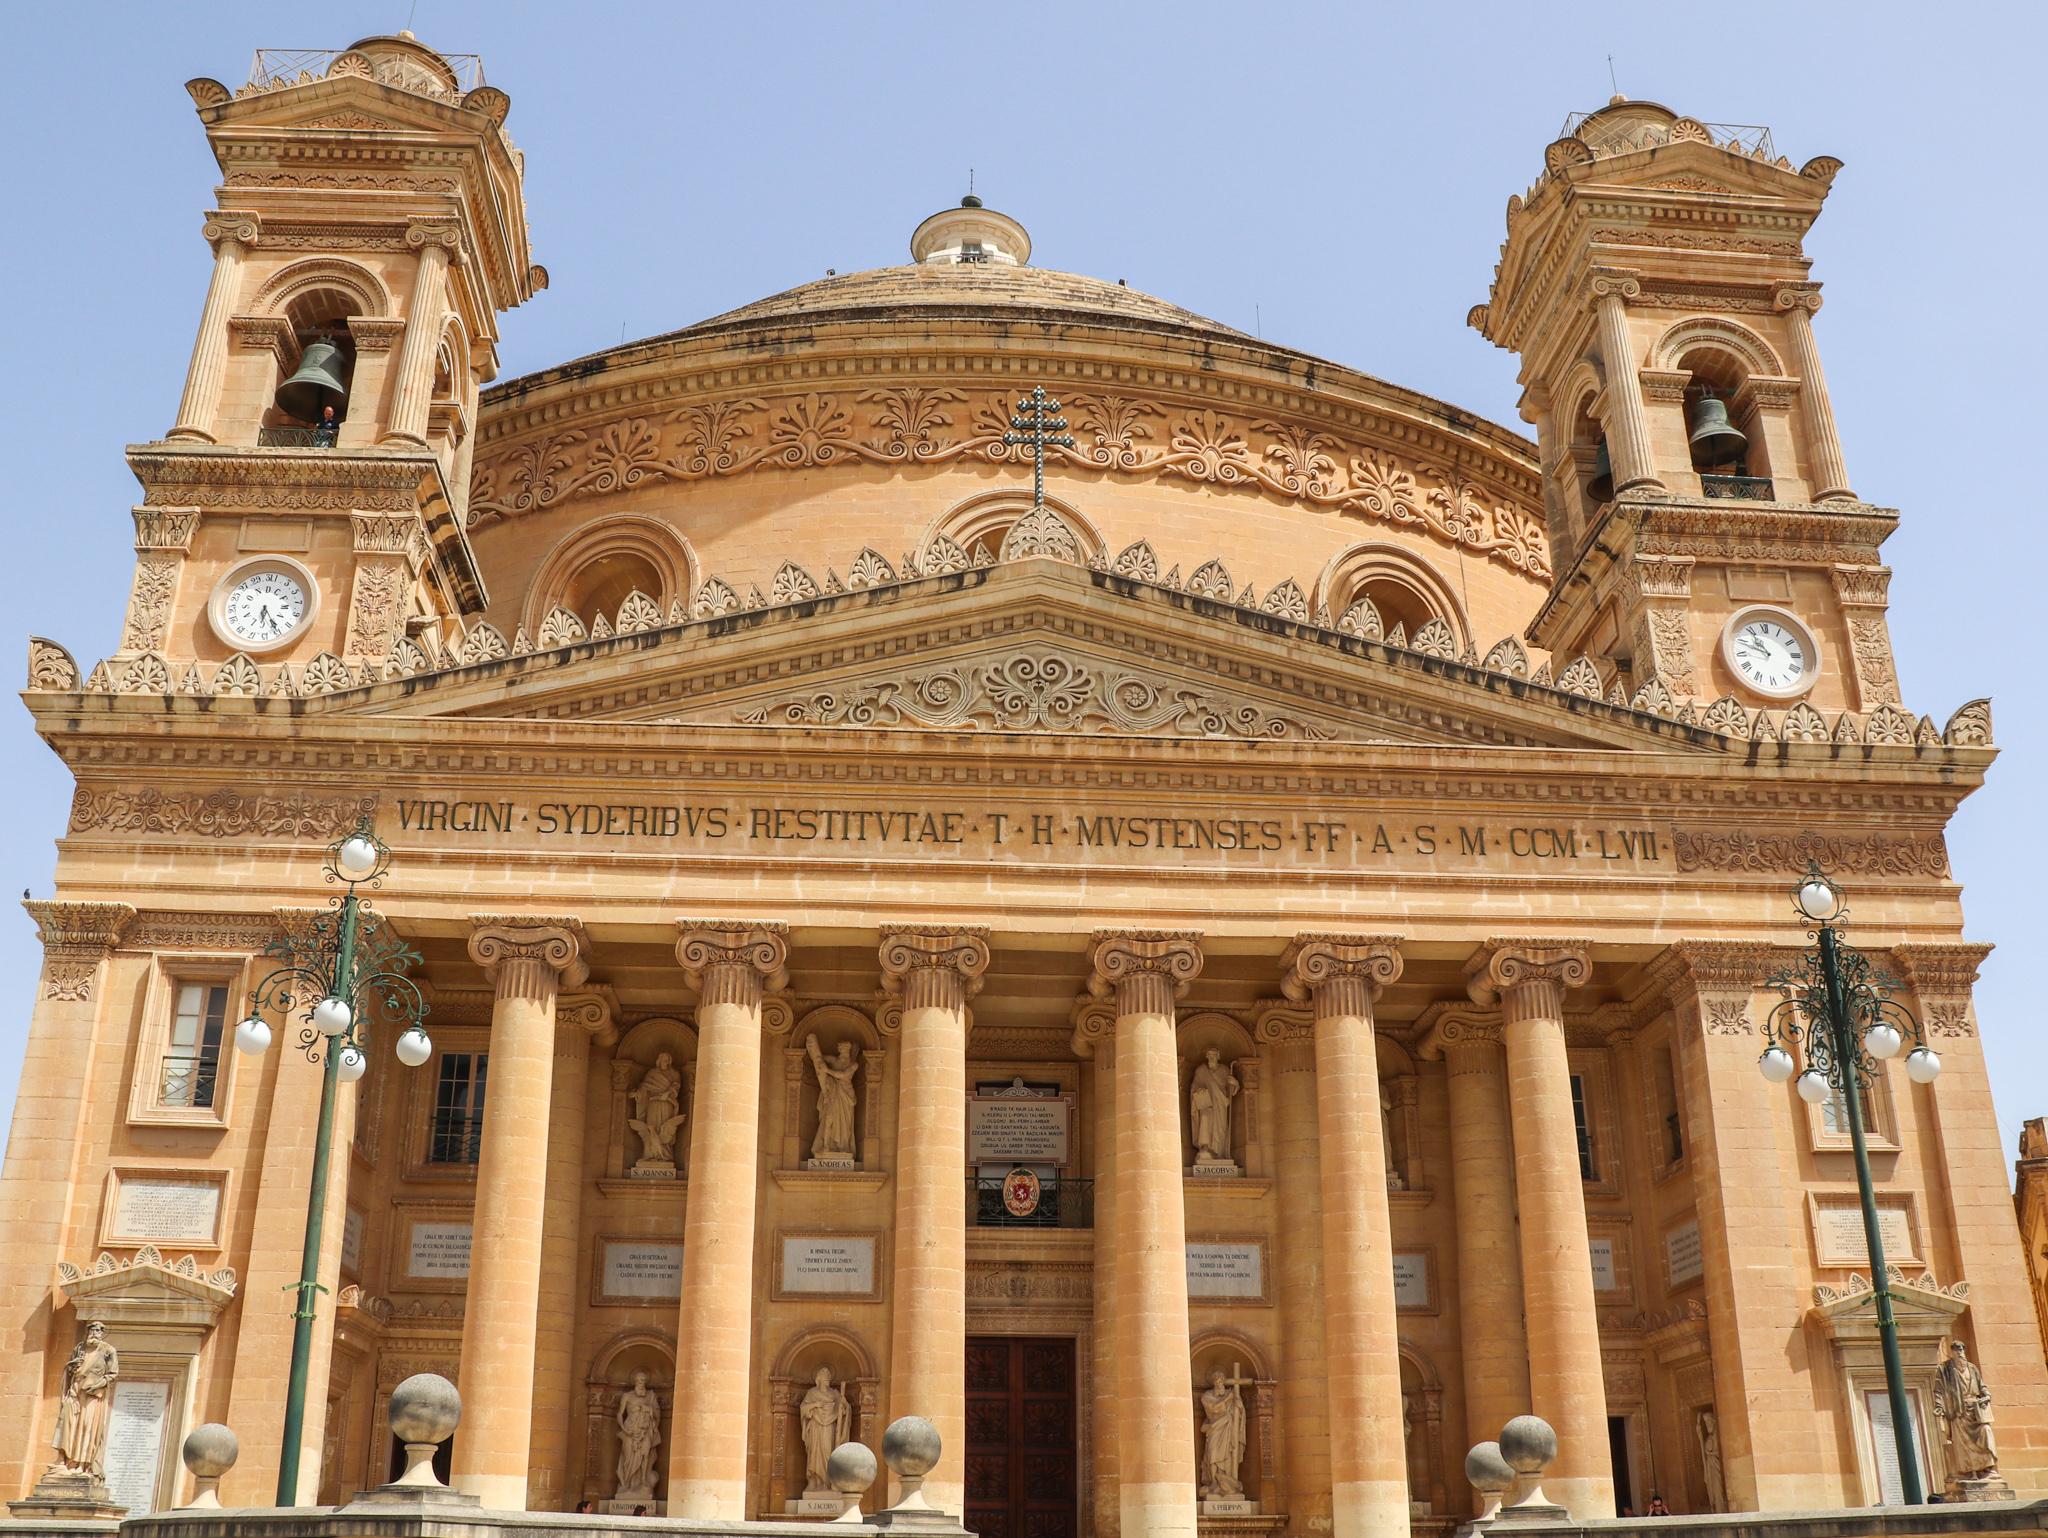 exterior da Igreja de Santa Maria em Mosta, Malta